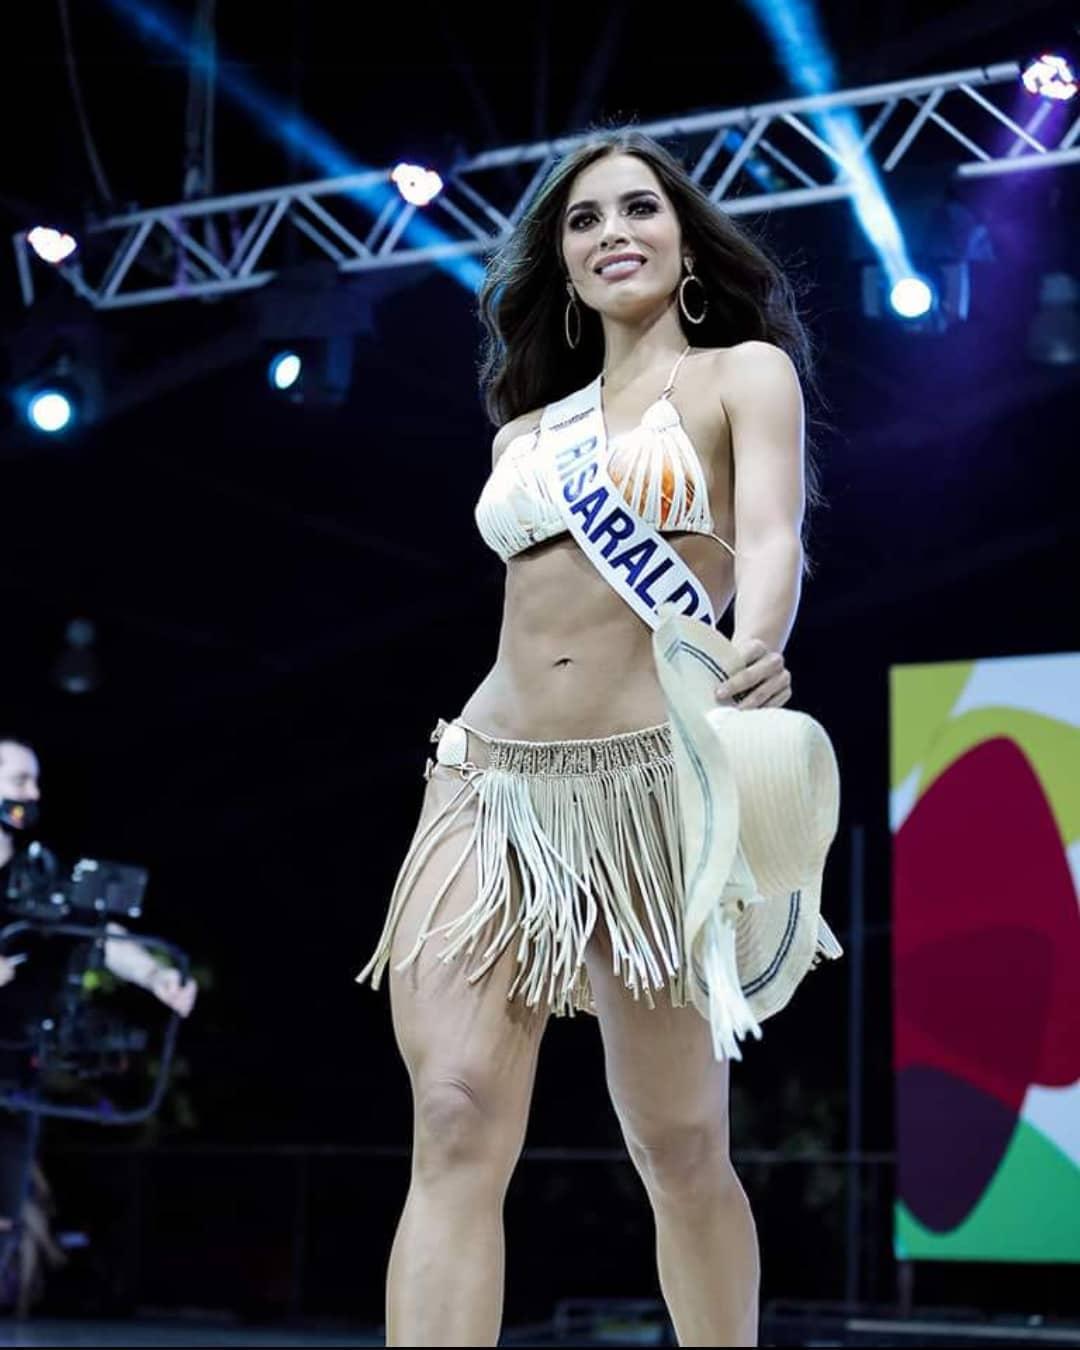 maria alejandra lopez perez, top 2 de miss universe colombia 2021/reyna hispanoamericana 2013/miss caraibes hibiscus 2014/miss colombia mundo 2015. - Página 4 24120613